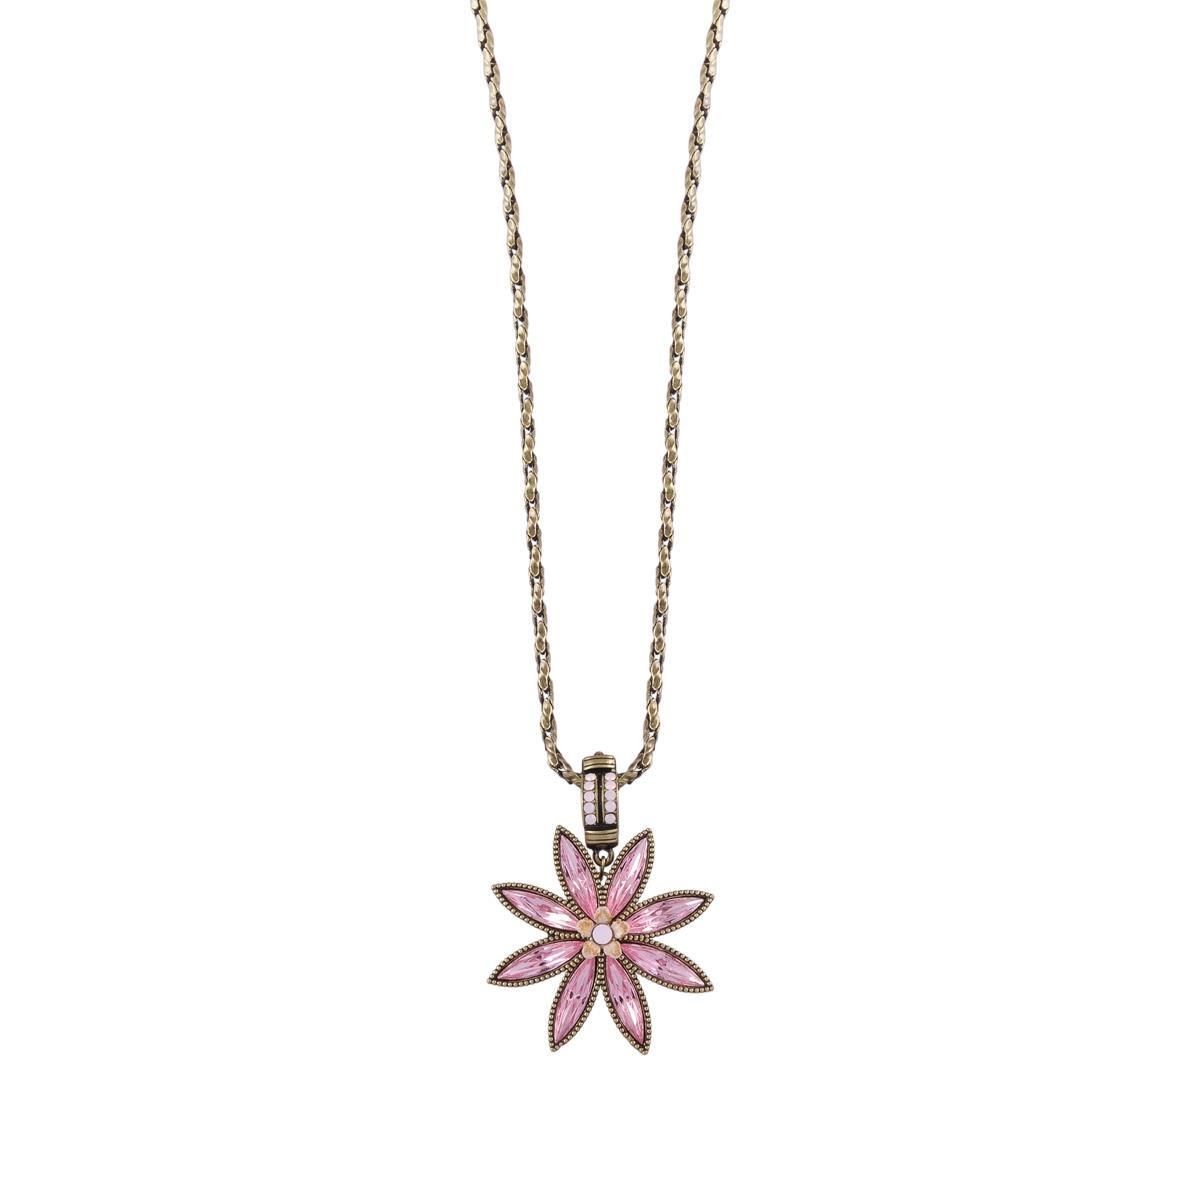 Negrin Summer Bloom Star Necklace